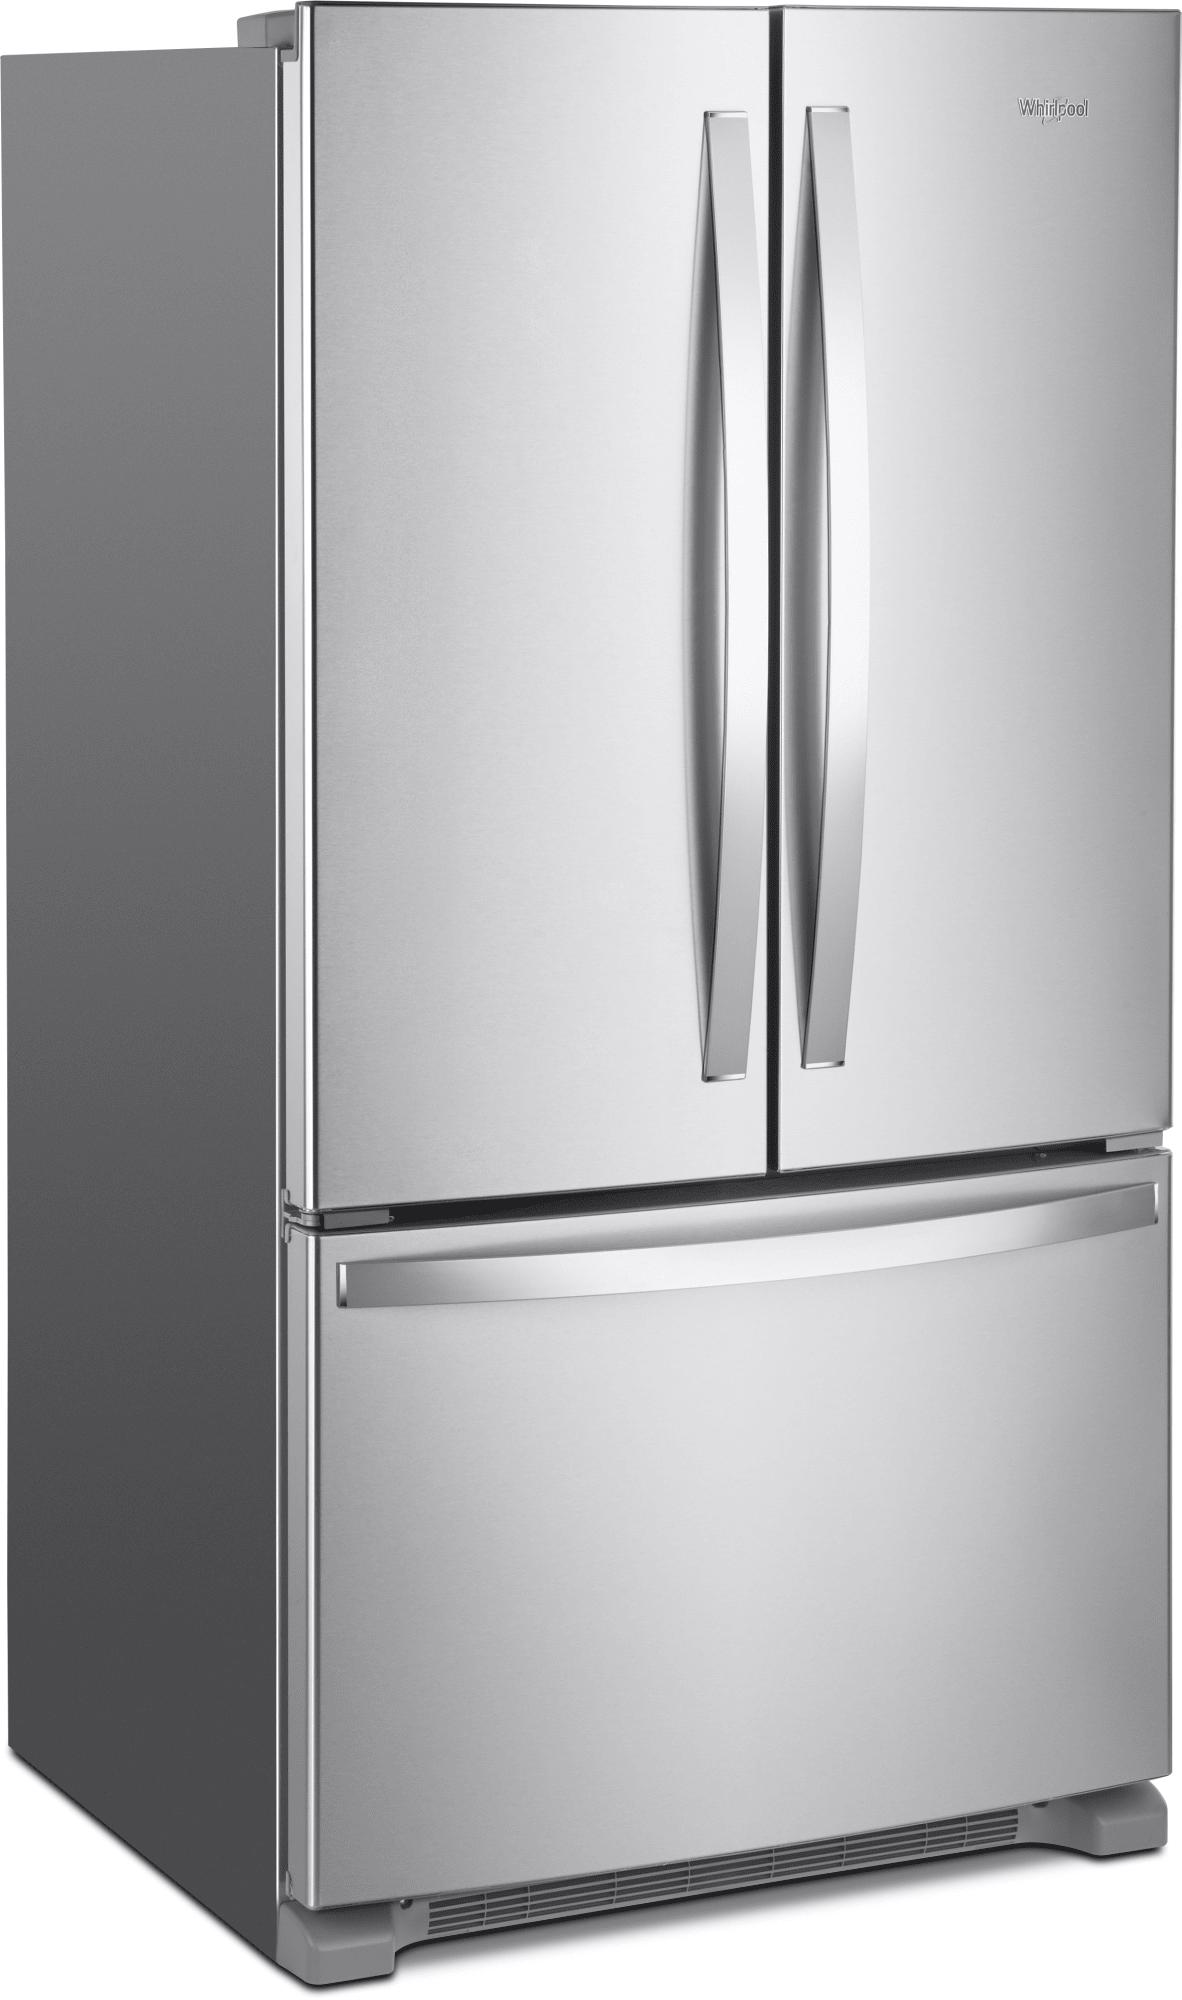 Whirlpool Wrf535swhz 36 Inch French Door Refrigerator With Interior Water Dispenser Everydrop Filter Temperature Controlled Drawer Freshflow Crisper Adjus French Door Refrigerator Glass Shelves French Doors